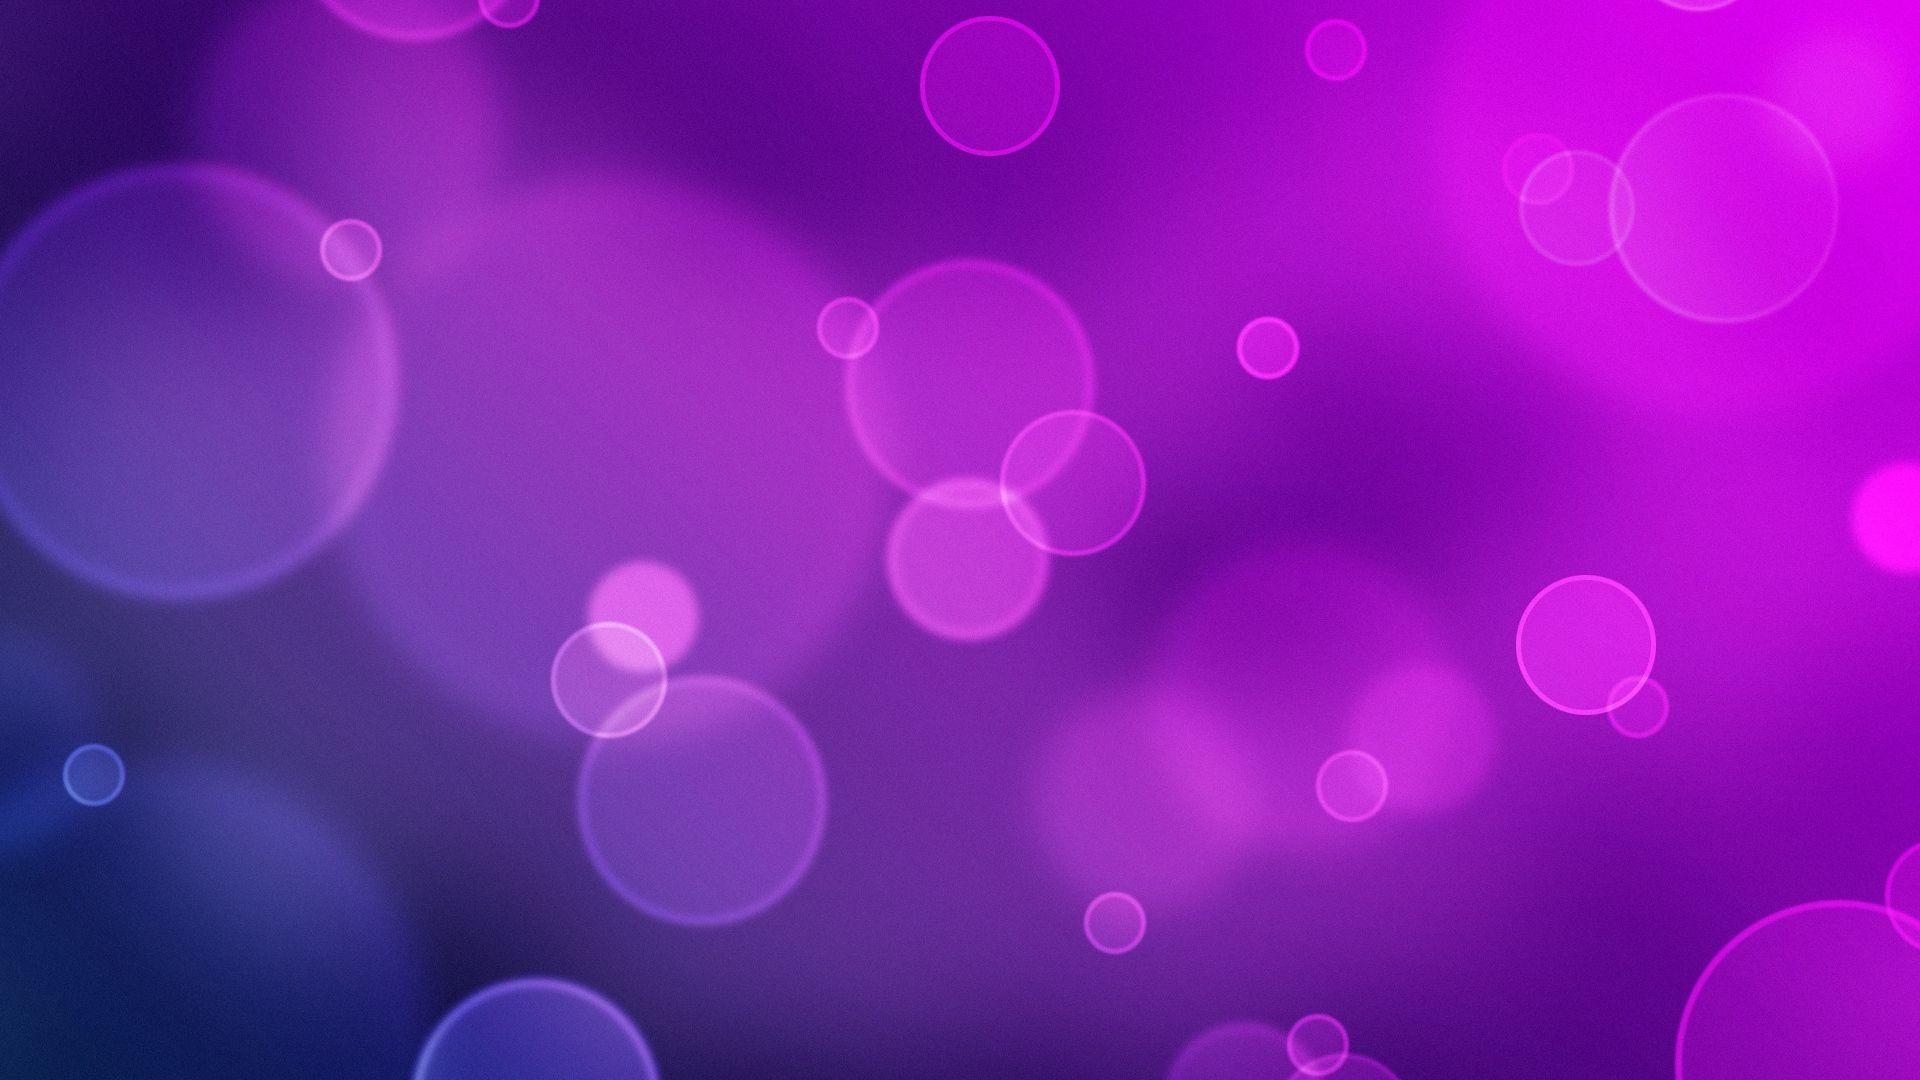 Purple And White pc wallpaper